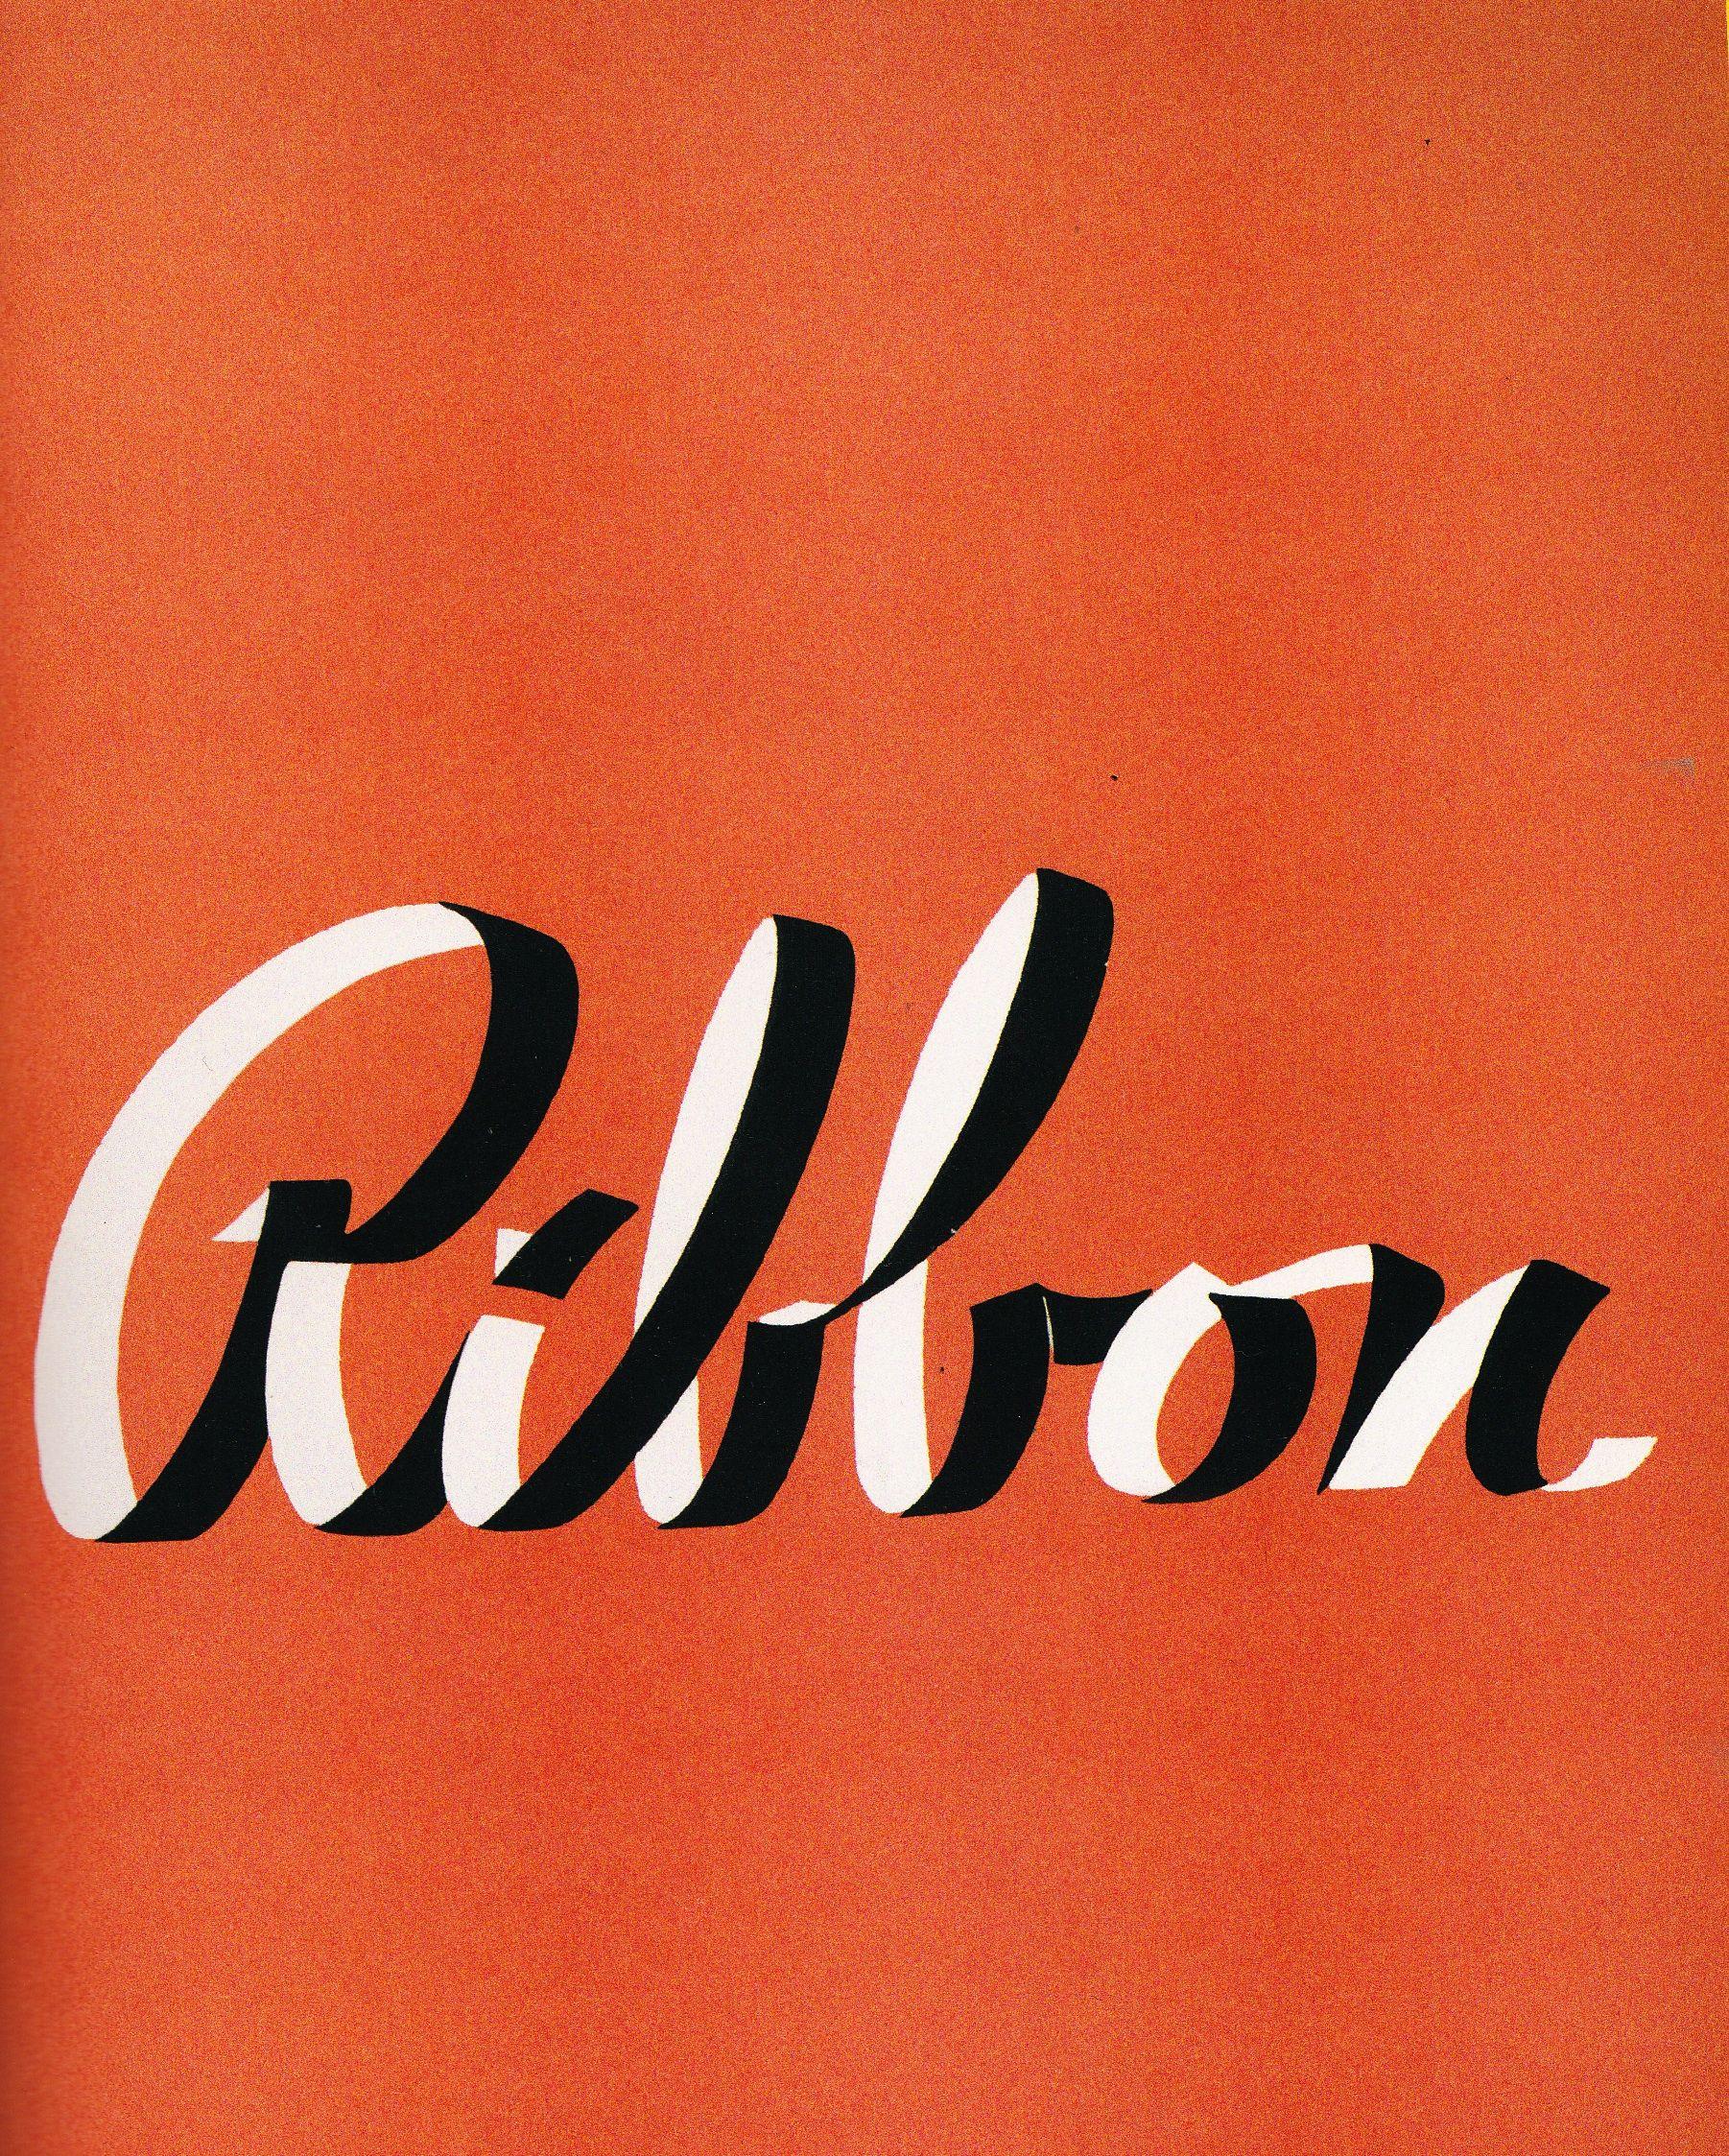 70 creative typography designs inspiration 2013